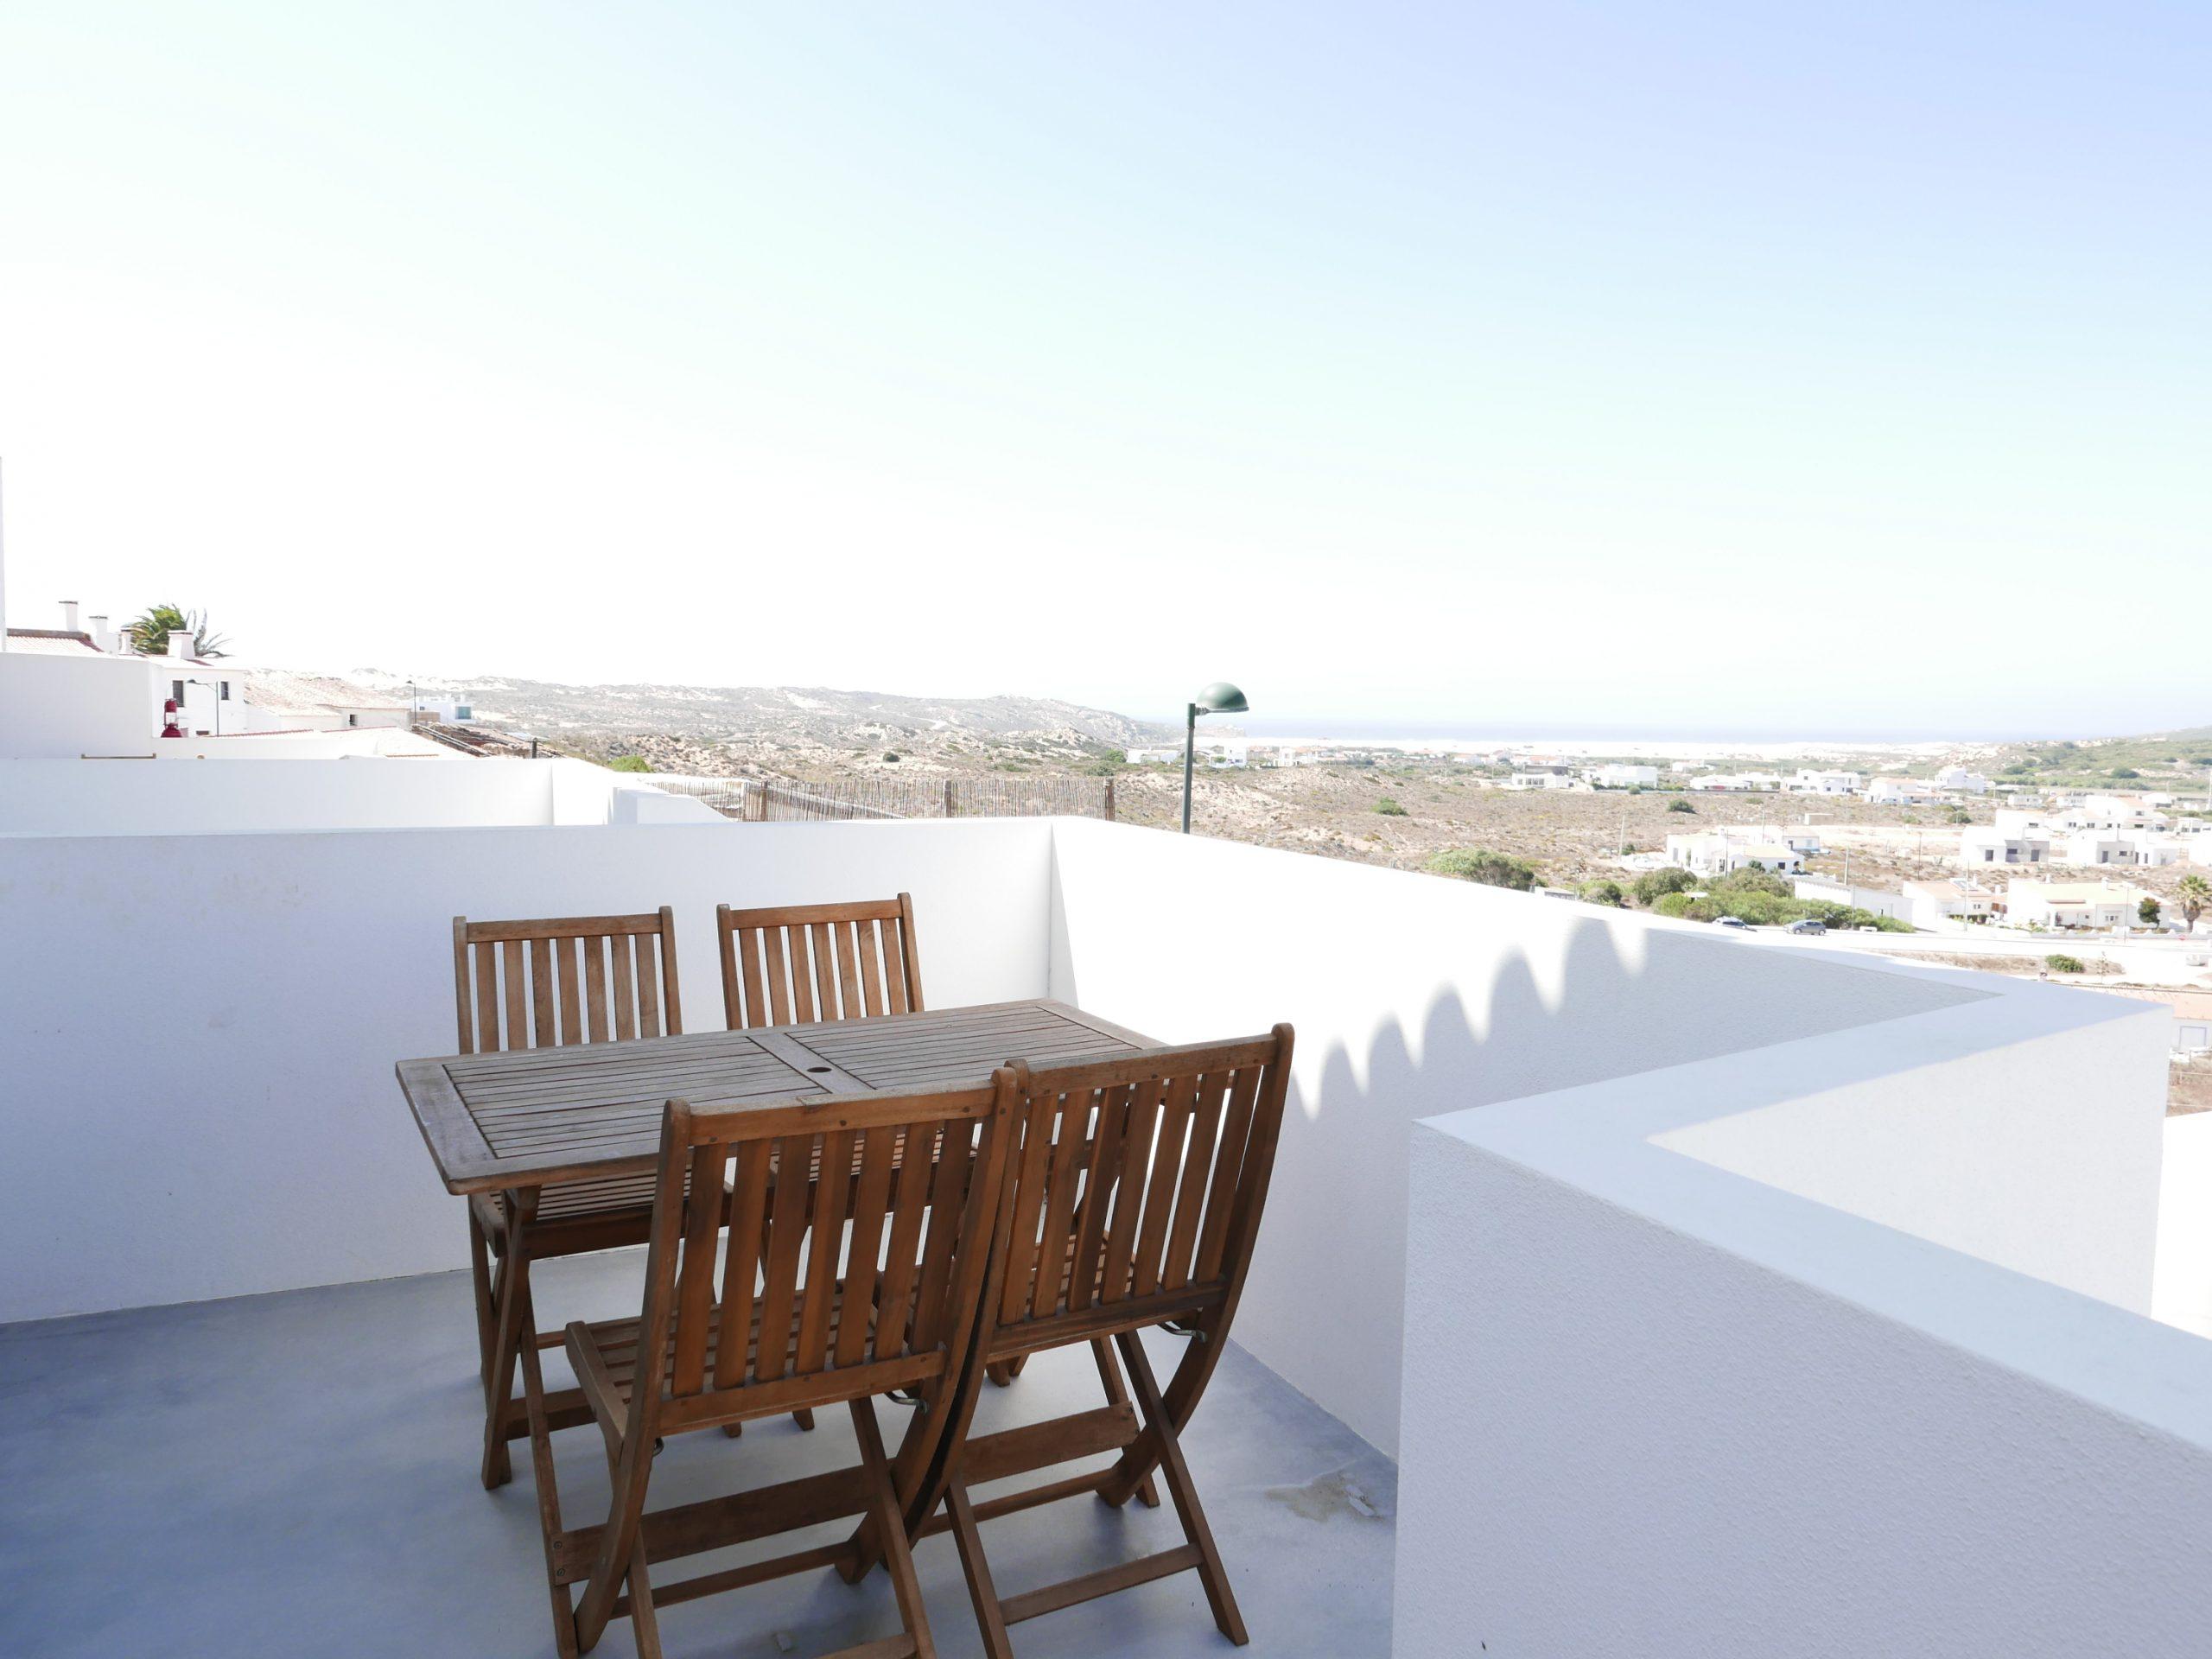 Location appartements et villas de vacance, Casa na Carrapateira à Carrapateira, Portugal Algarve, REF_IMG_14807_14815